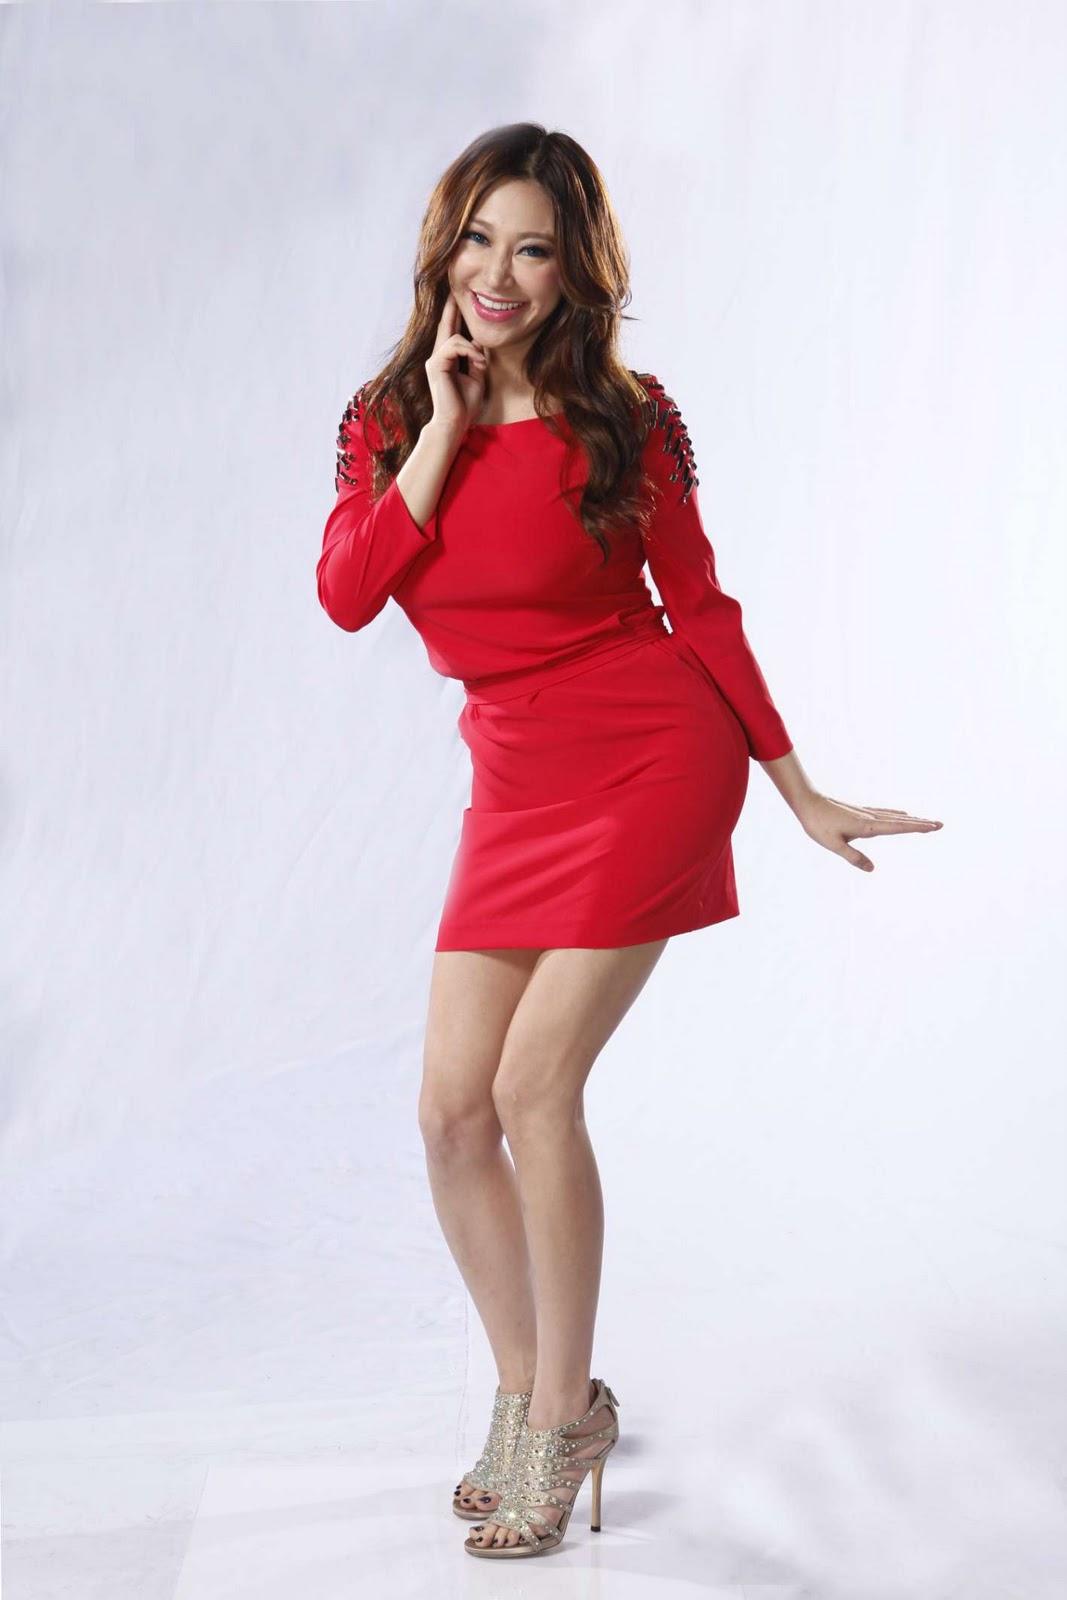 Rufa Mae Quinto Net Worth